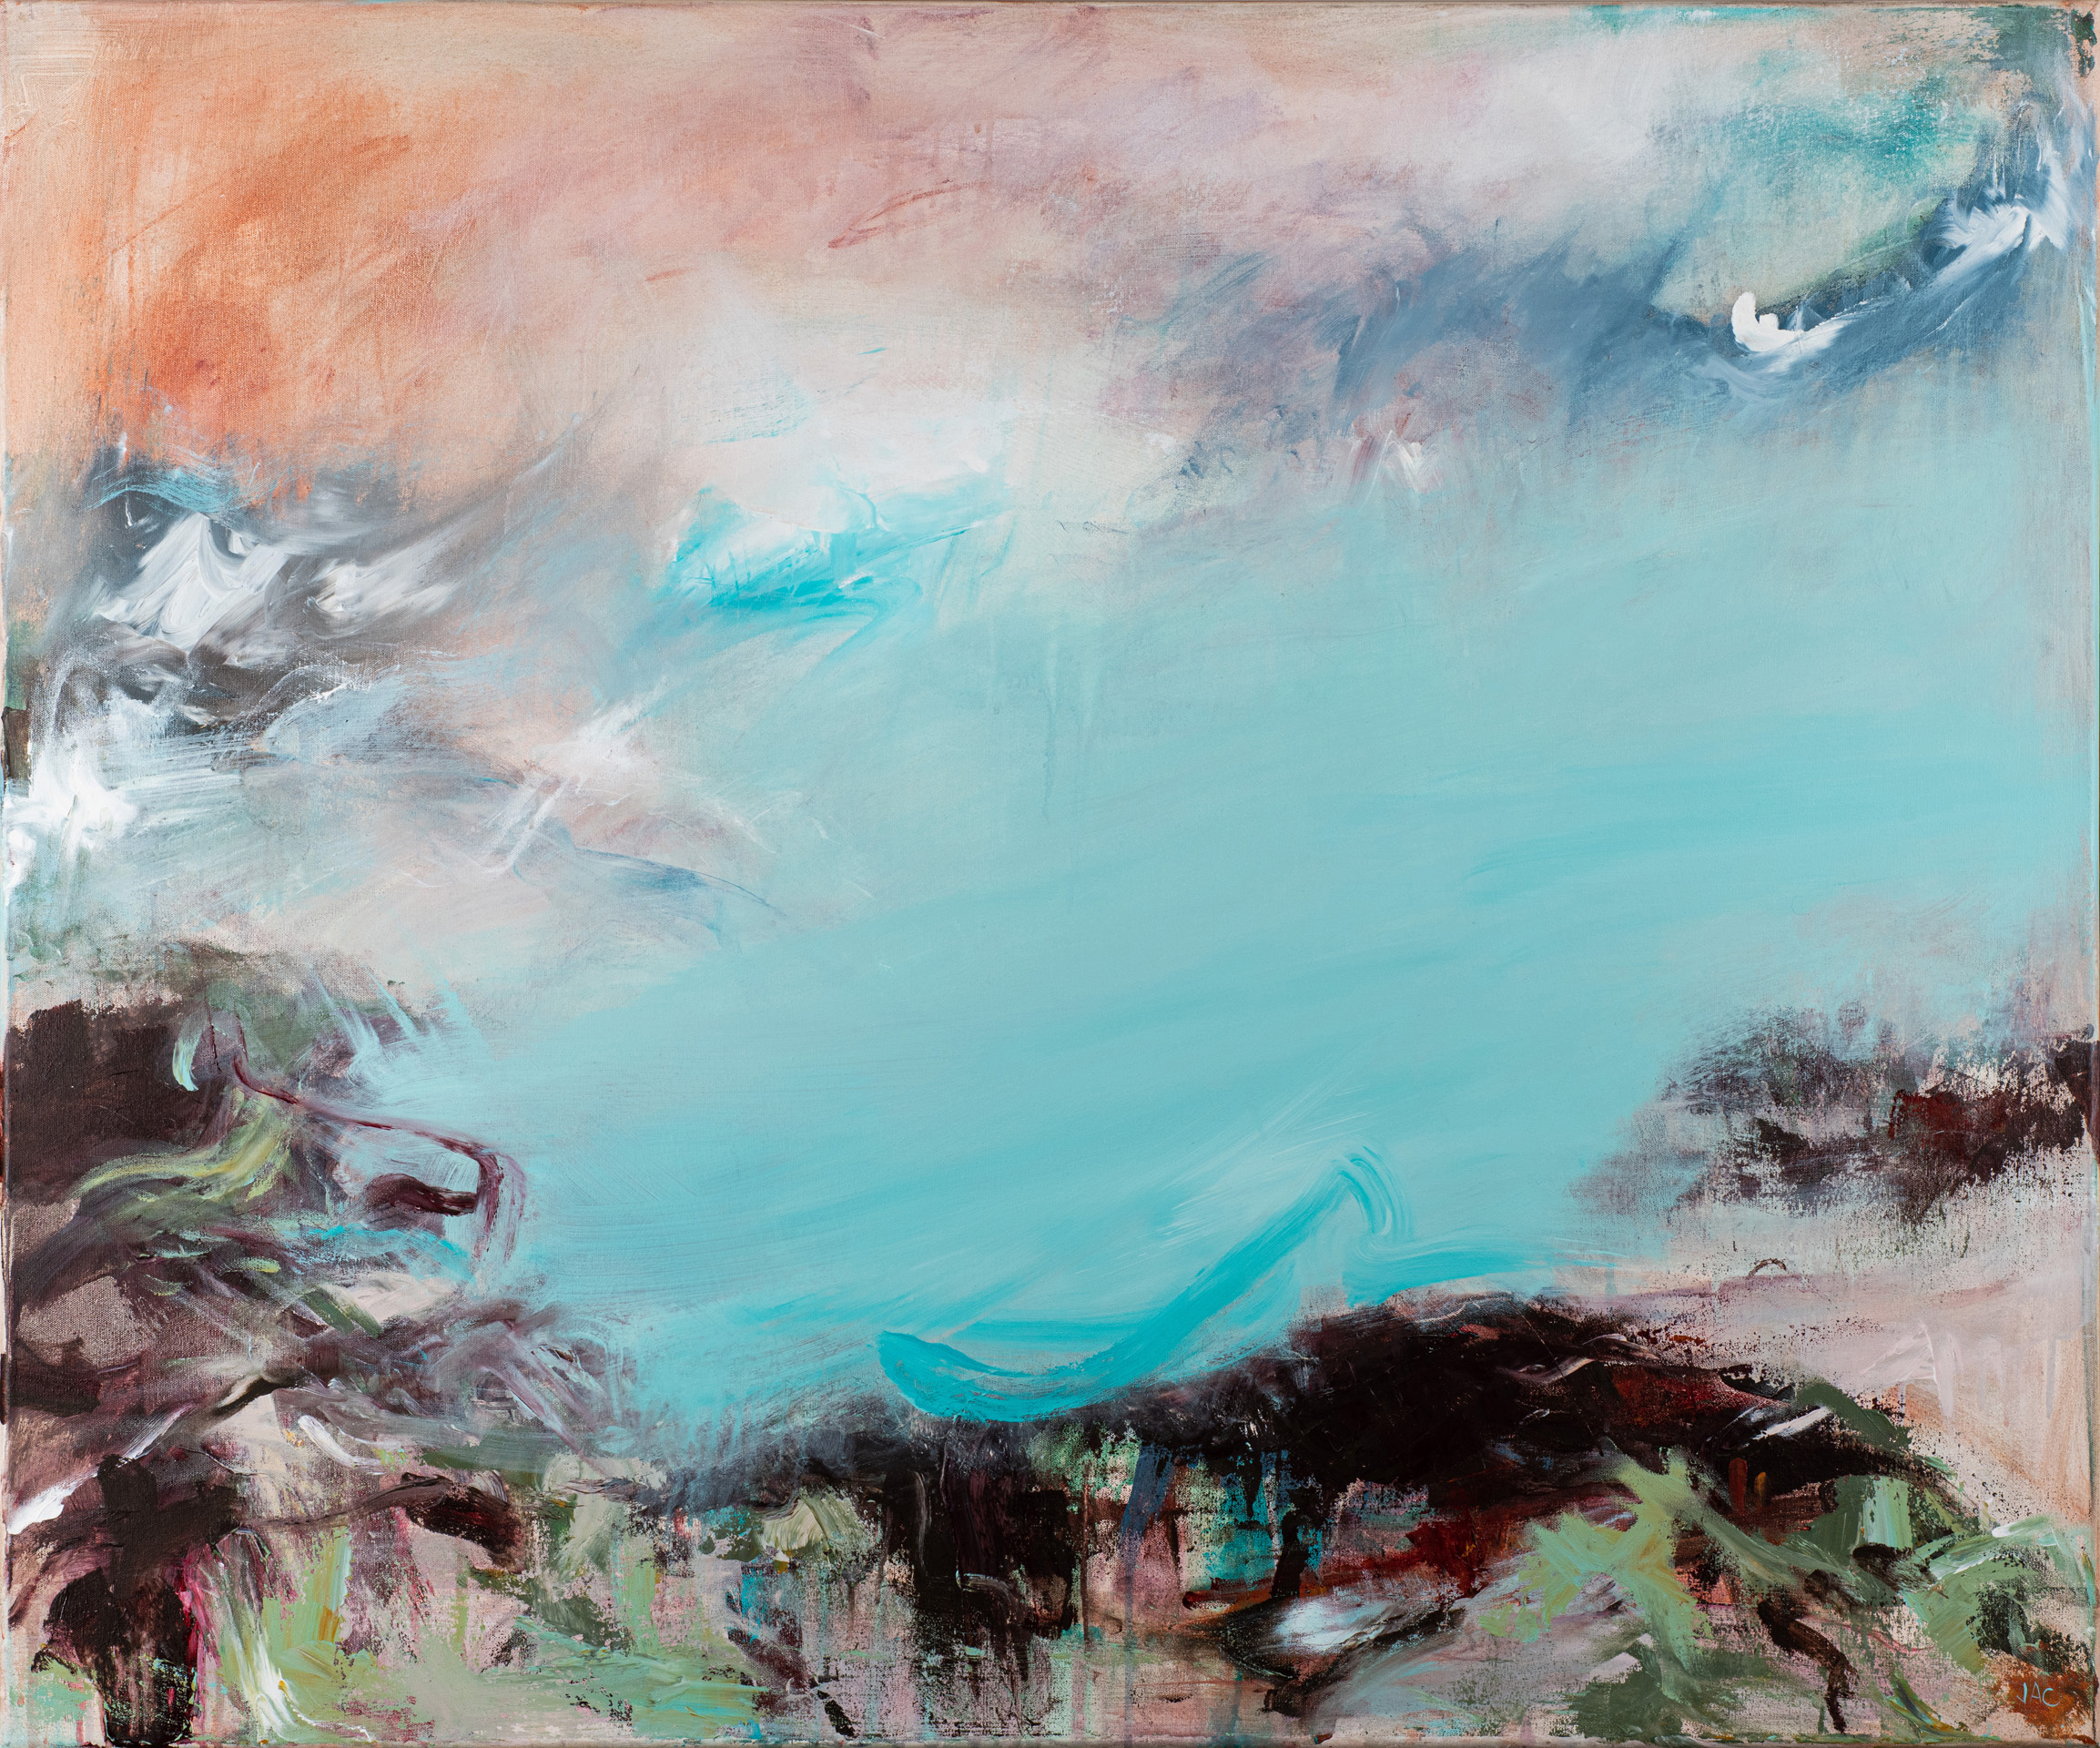 All Along The Sky by Jill Campbell, Acrylic on canvas